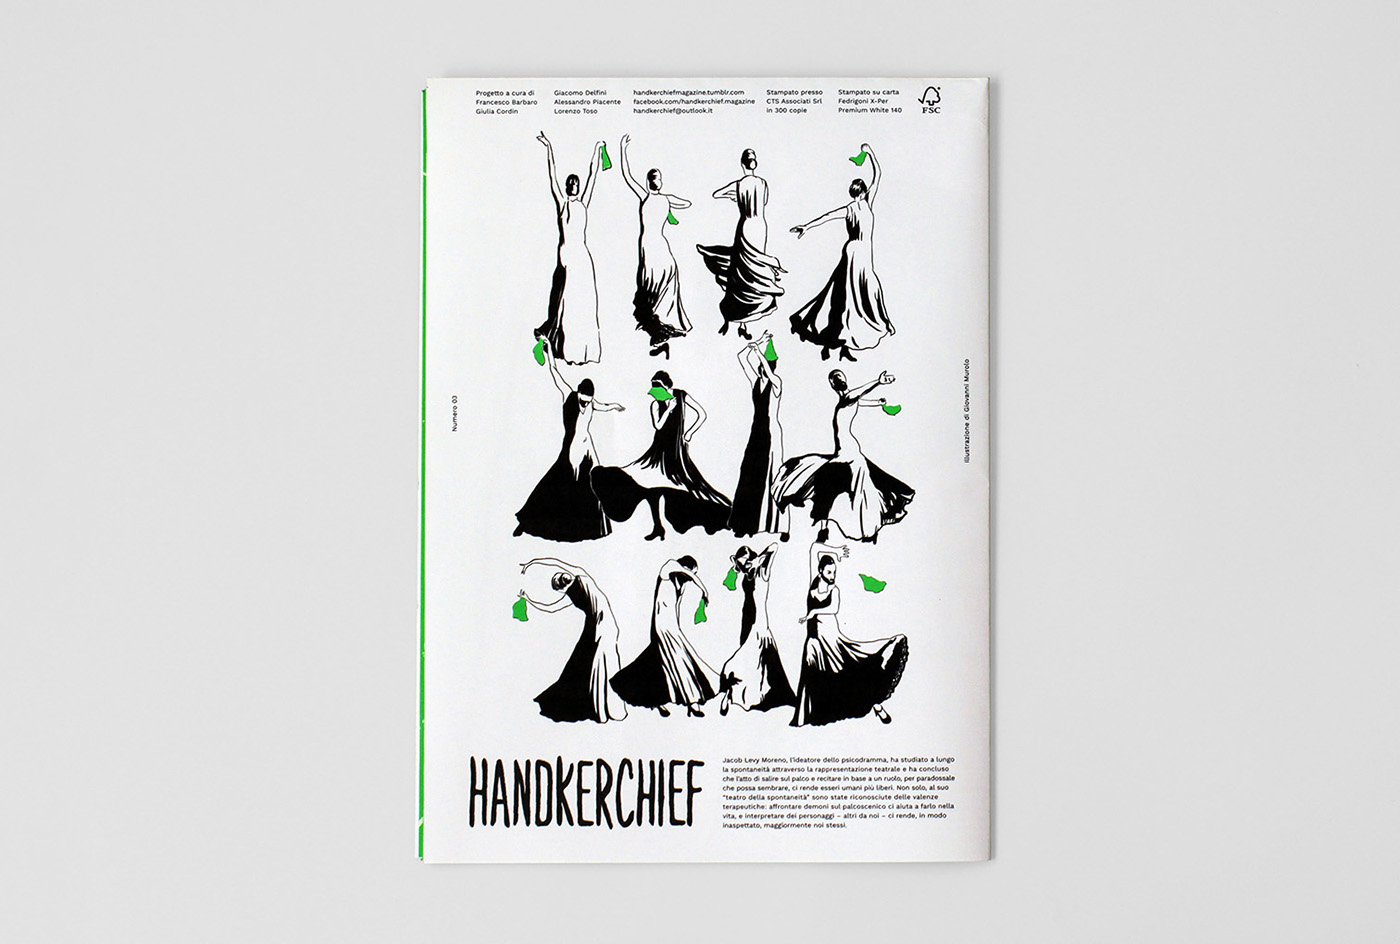 Handkerchief magazine LGBT homophobia transphobia